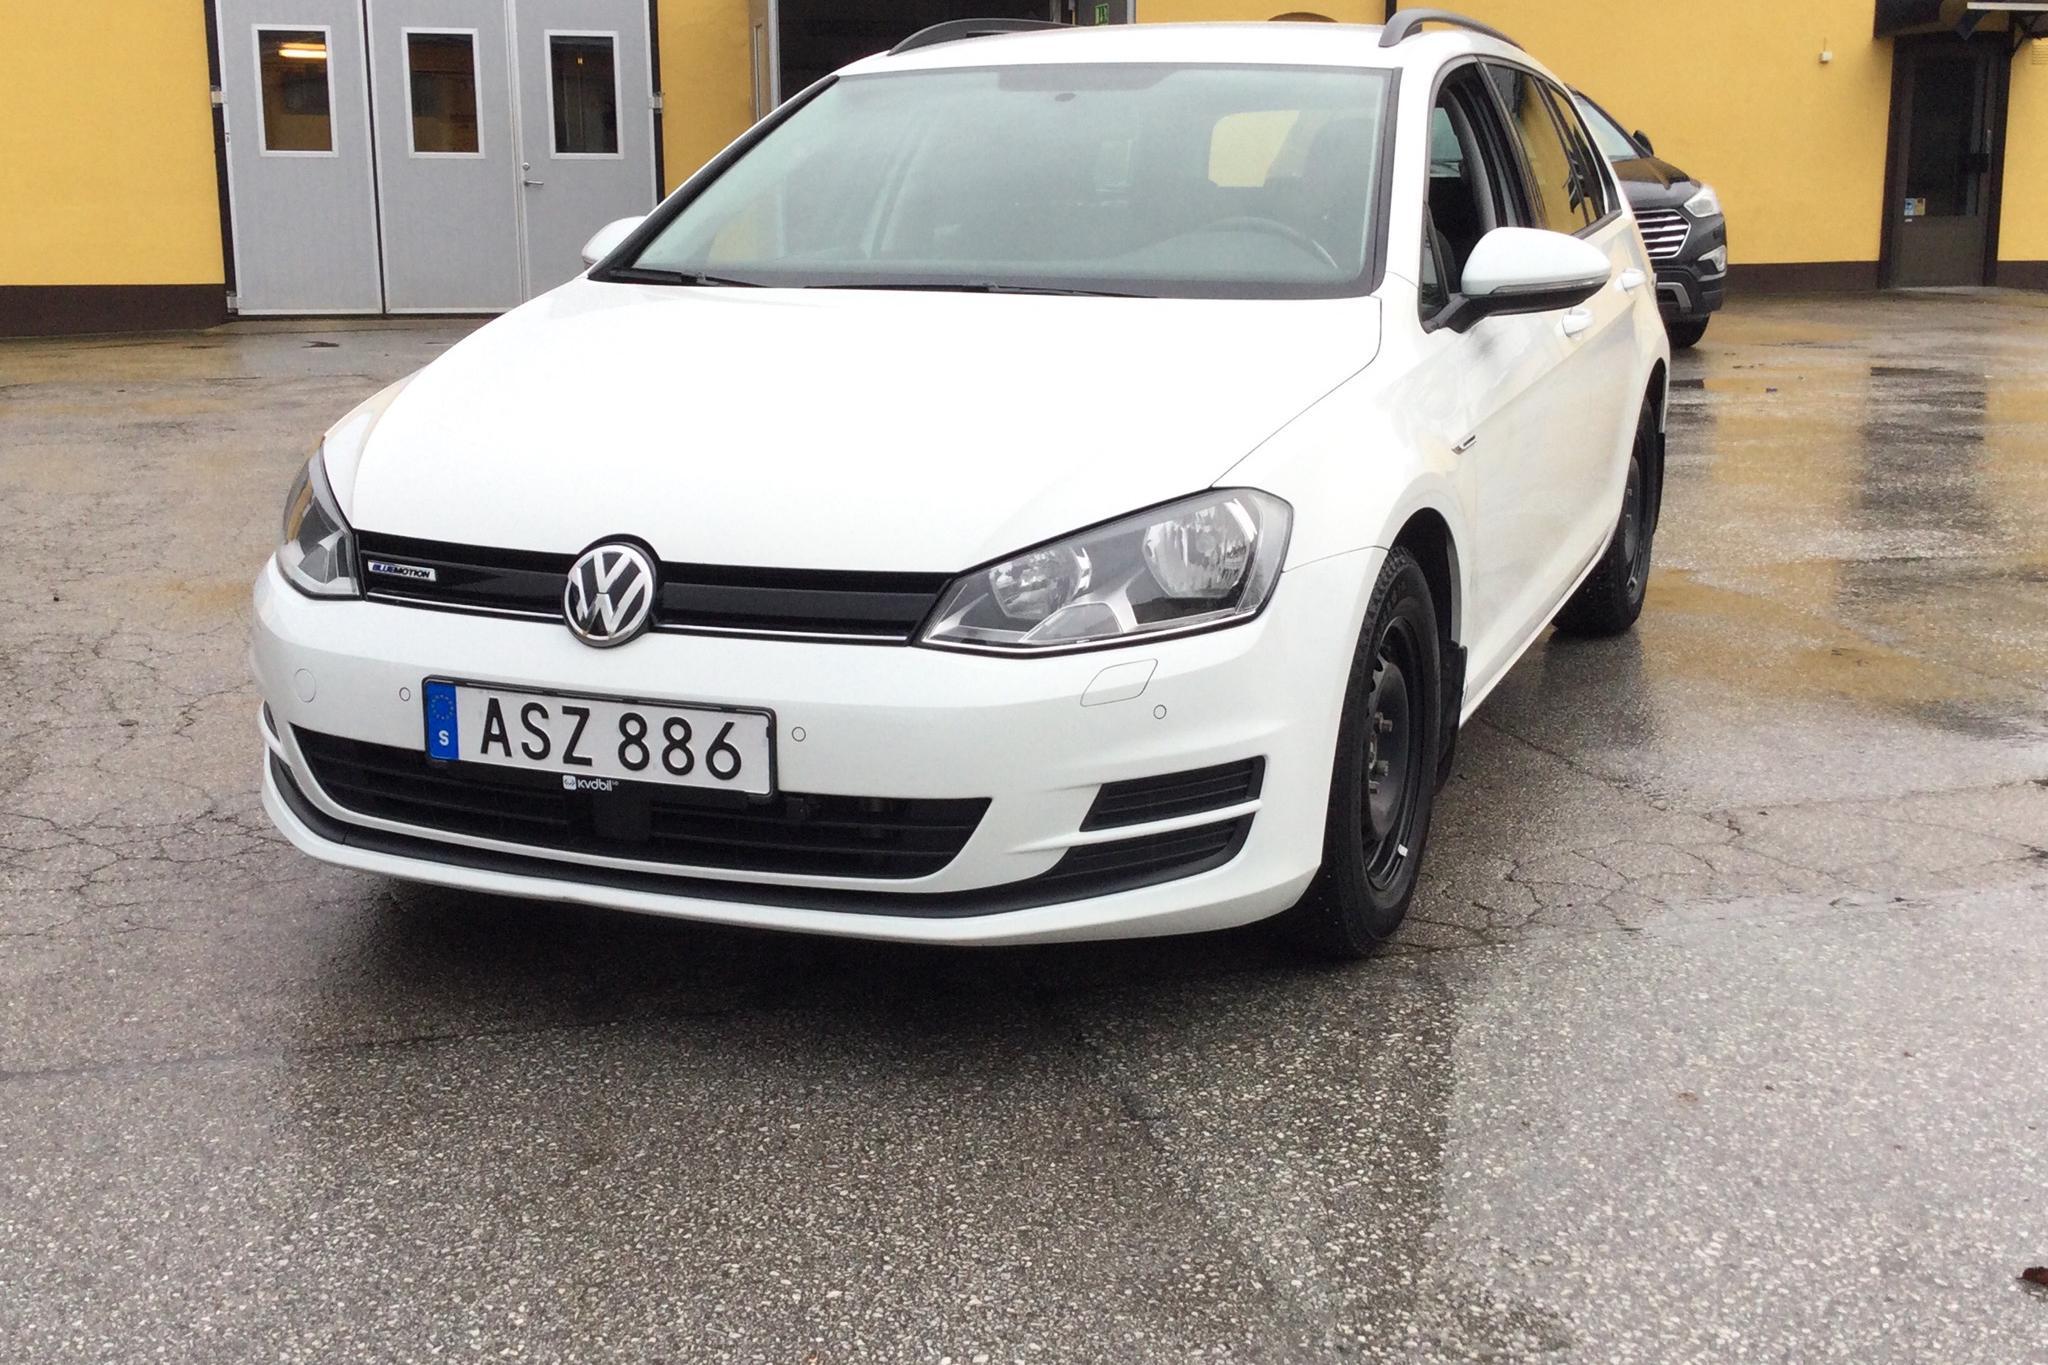 VW Golf VII 1.4 TGI BlueMotion Sportscombi (110hk) - 43 910 km - Manual - white - 2015